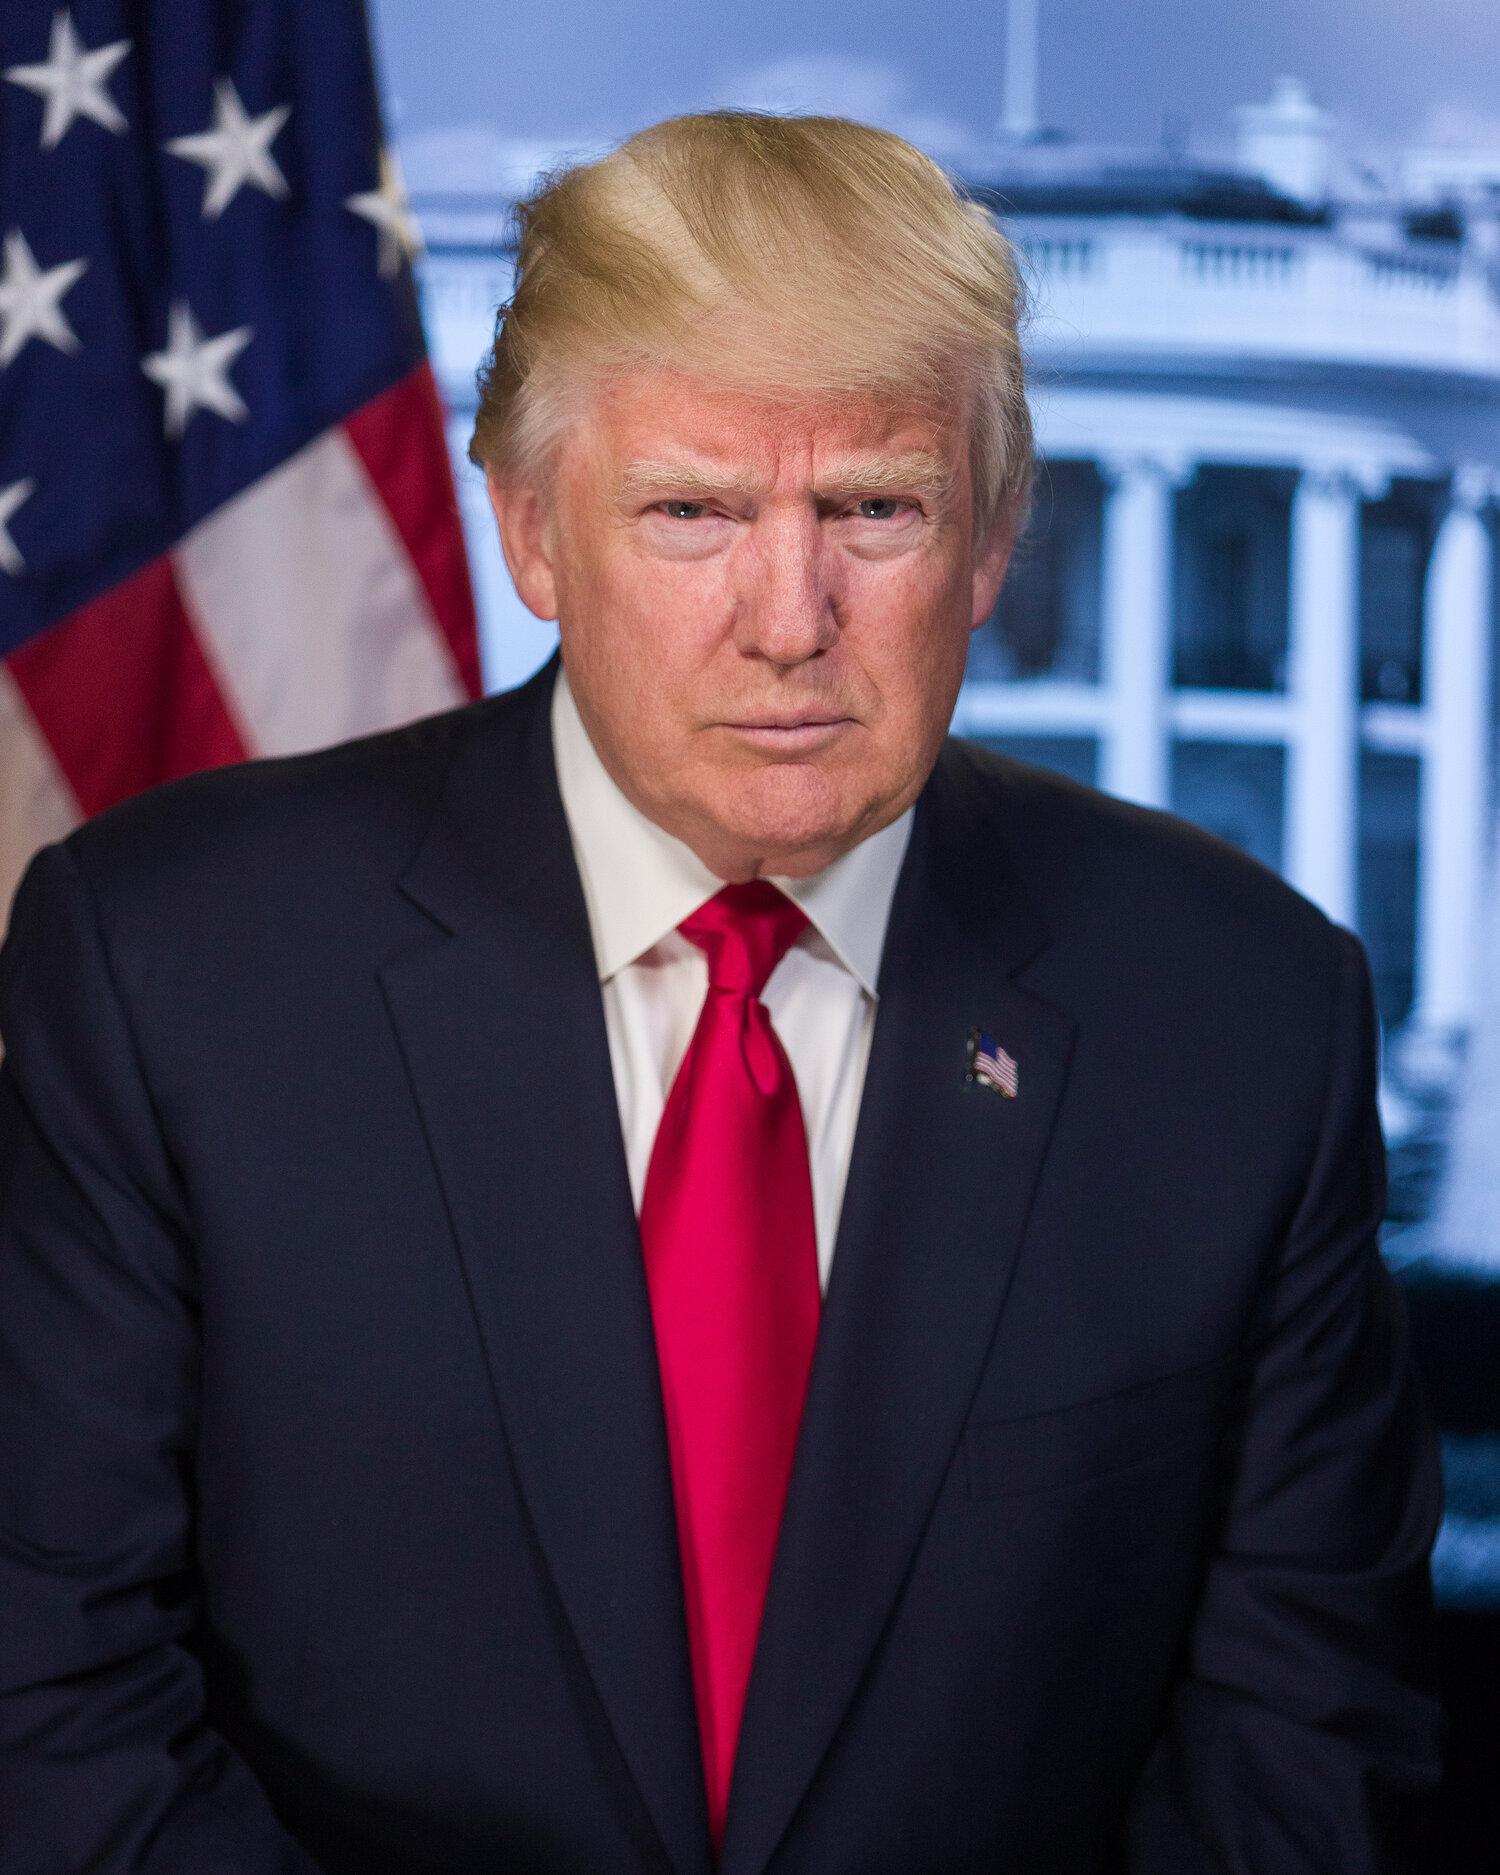 Trump: an Alpha in power